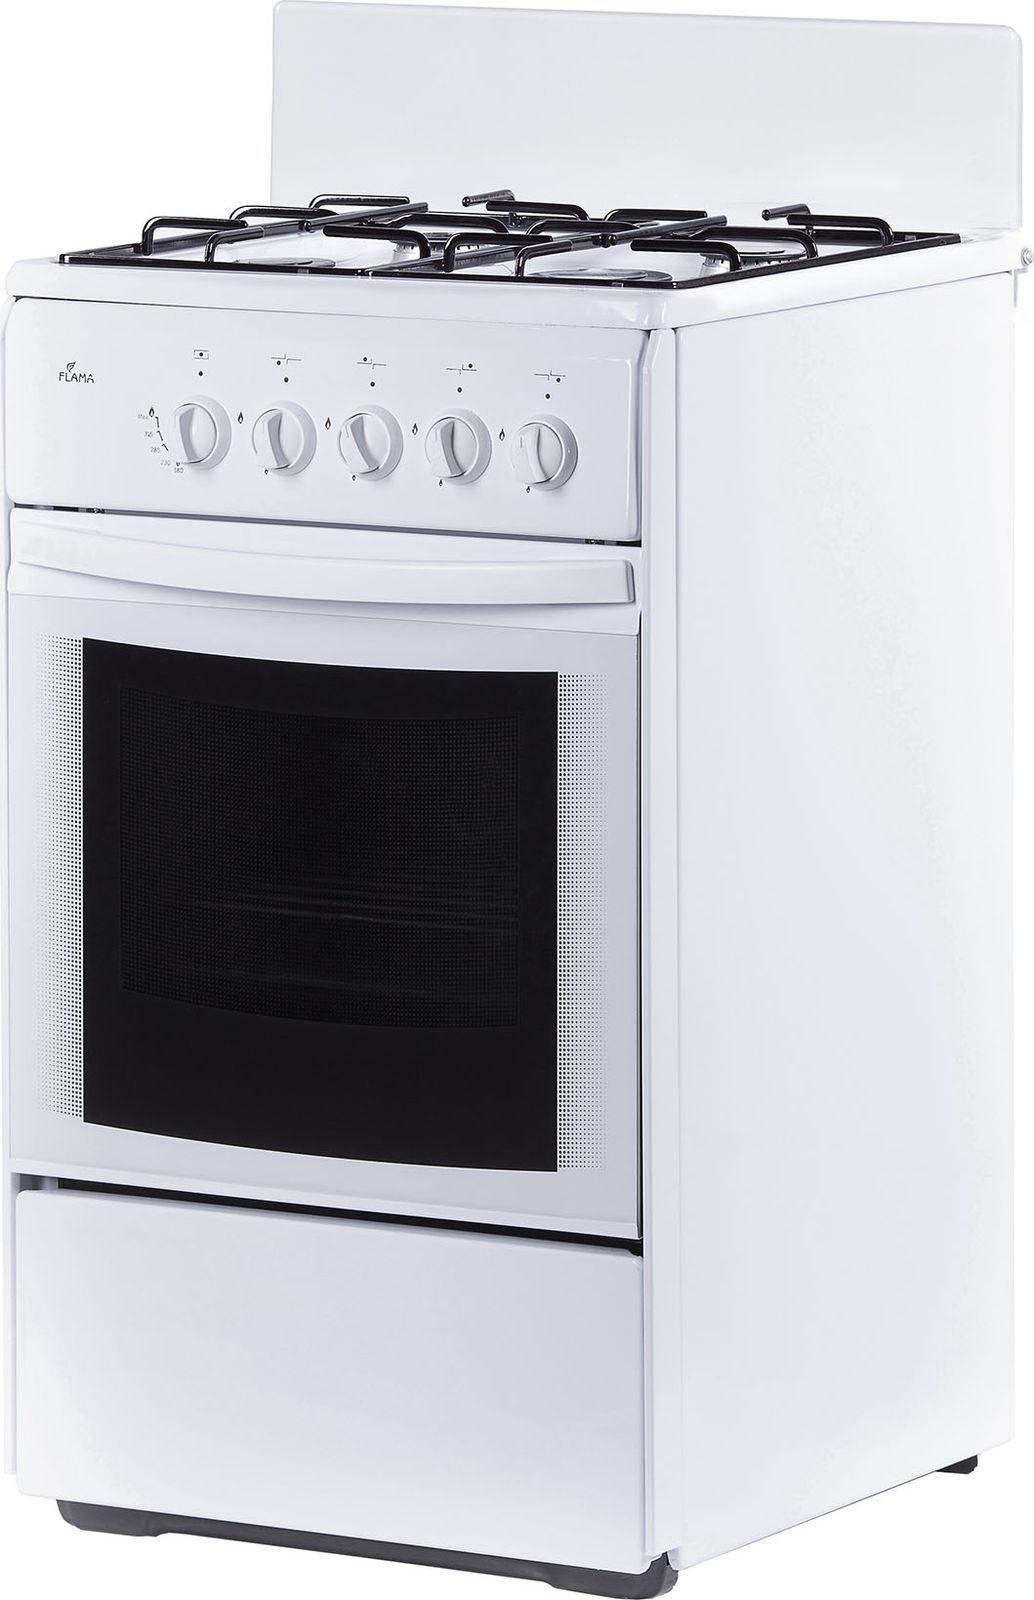 Кухонная плита Flama RG 24035 W, белый